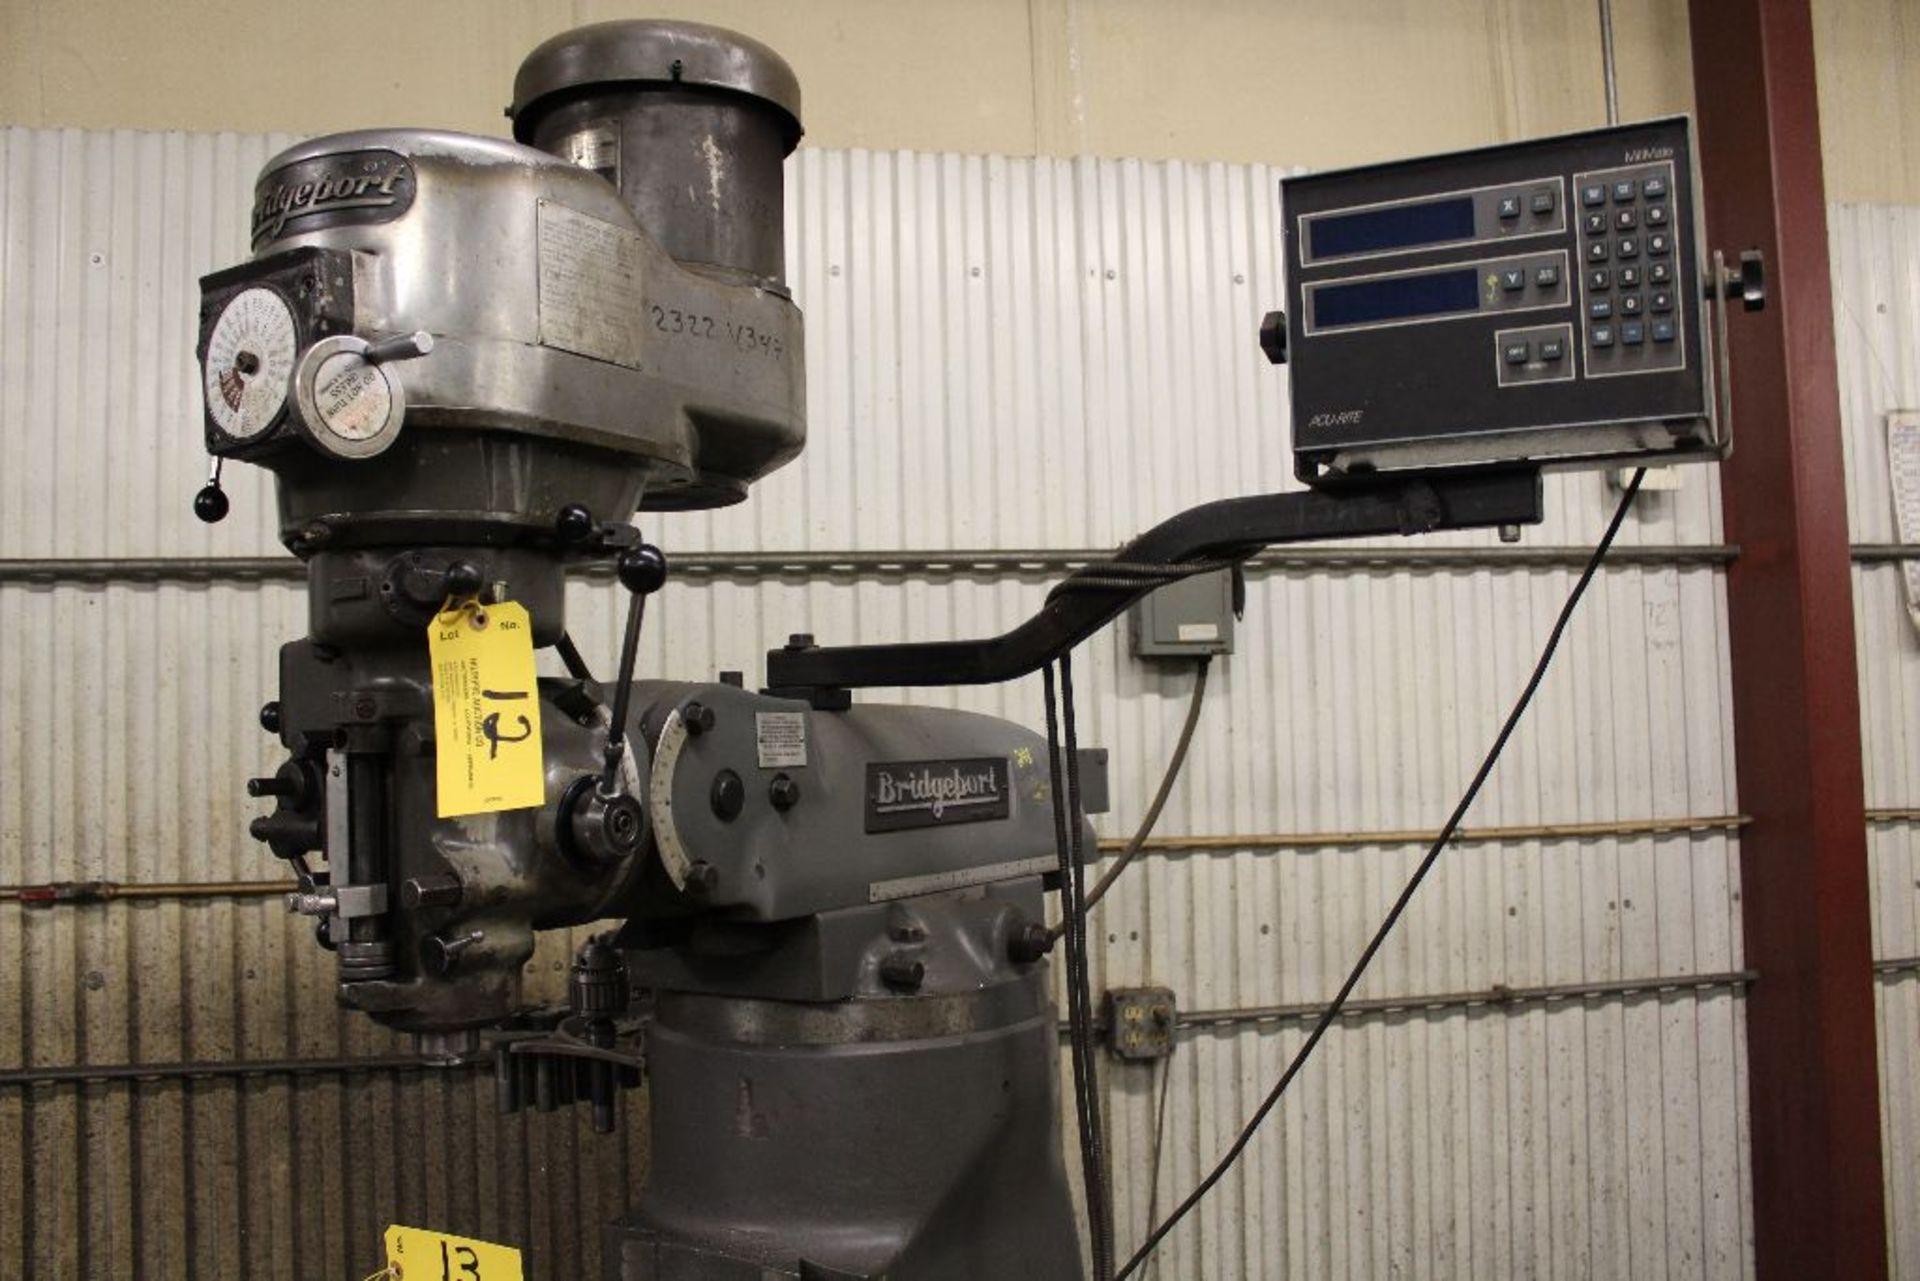 Lot 012 - Bridgeport vertical mill model V2, sn V2ES199, 2 hp, Acu-rite, digital readout model mill mate.